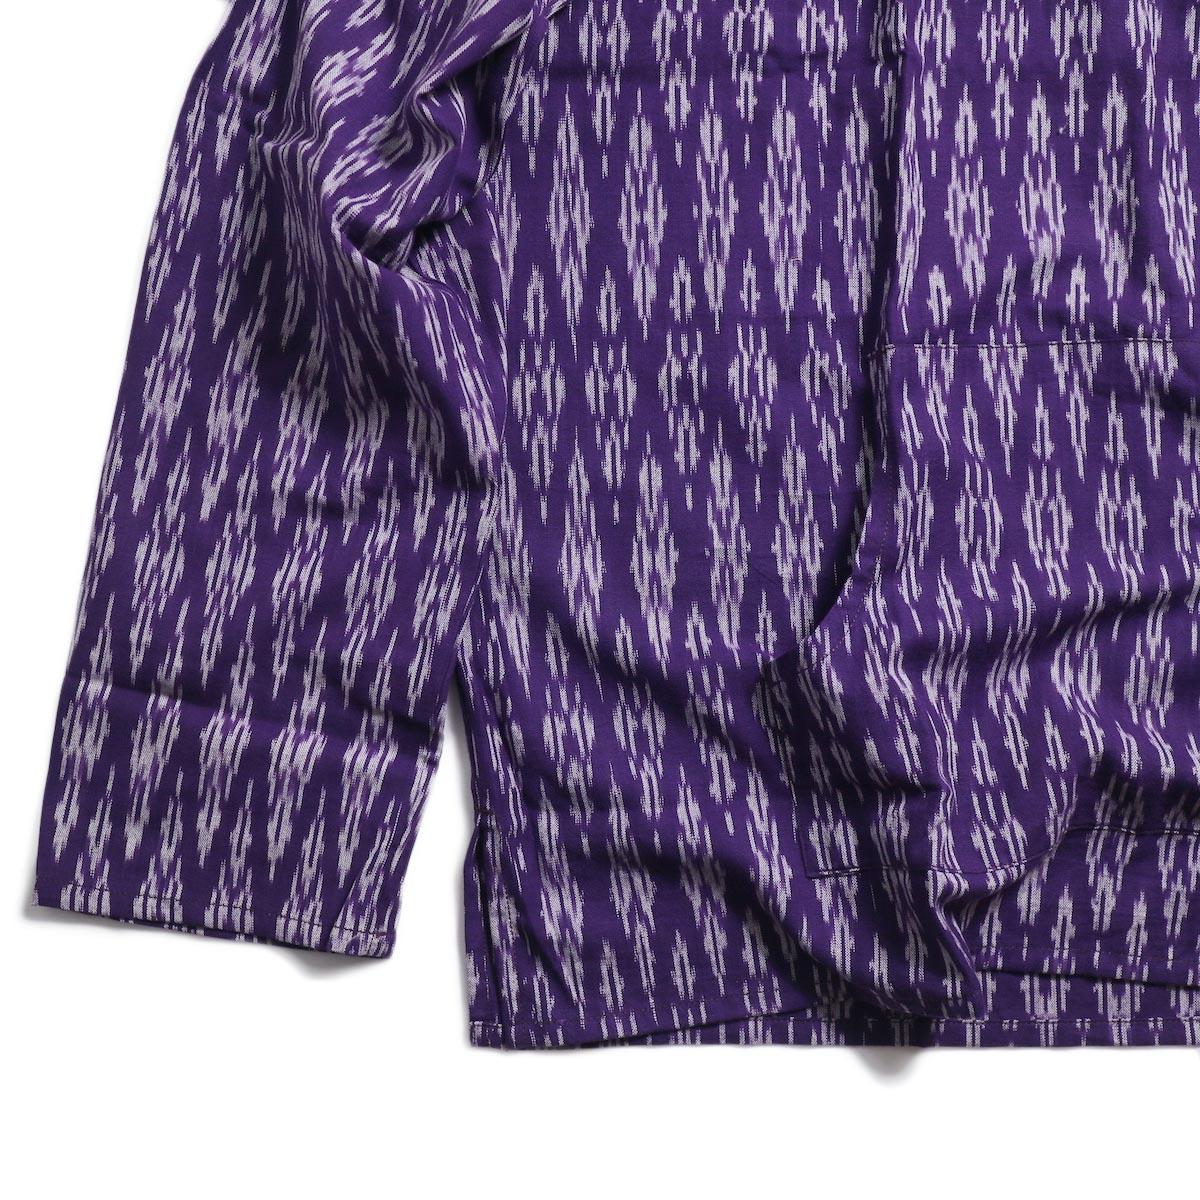 SOUTH2 WEST8 / Mexican Parka -Cotton Cloth / Splashed Pattern (Purple) 裾